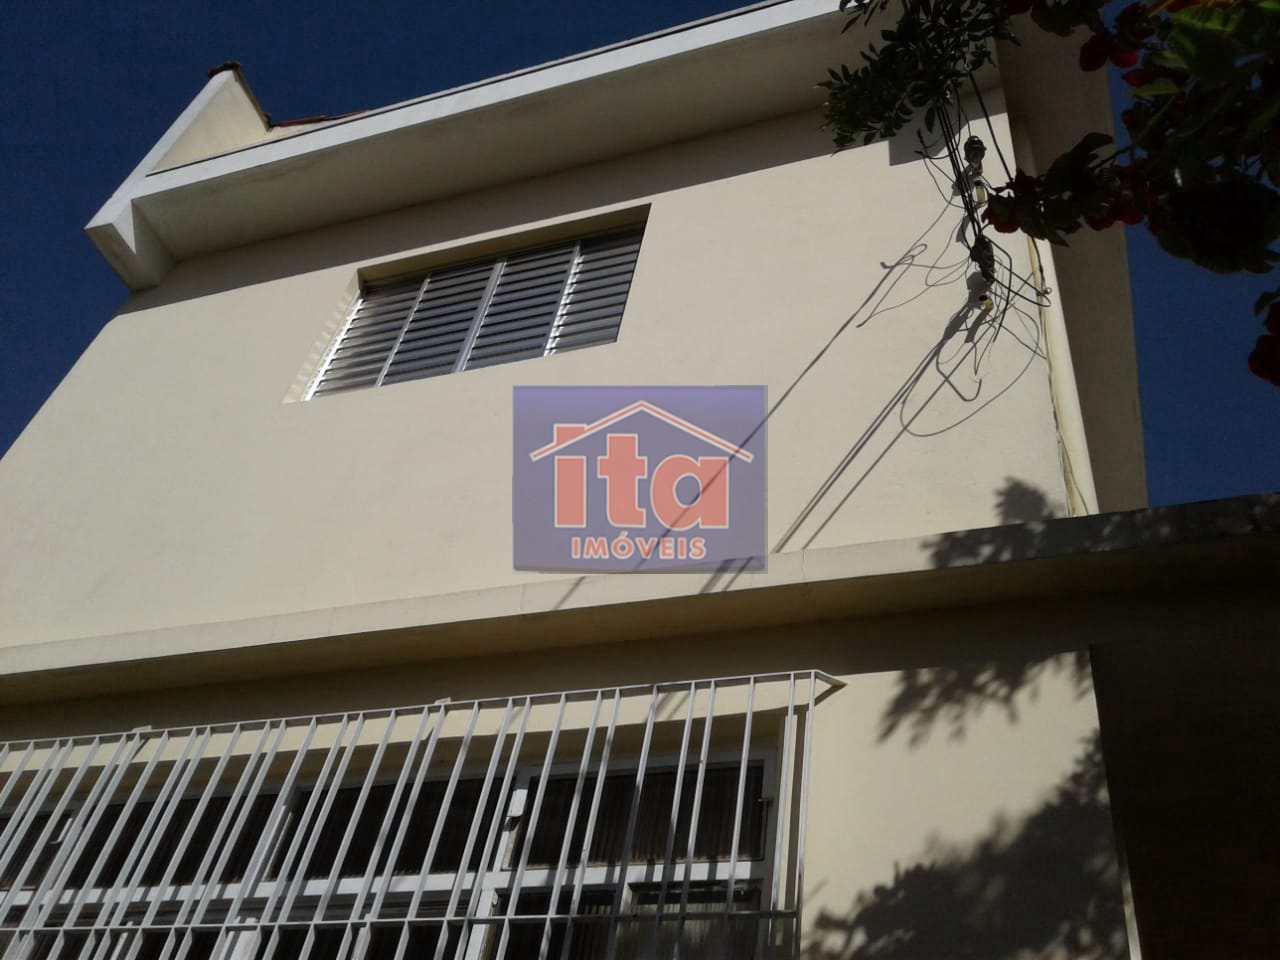 Casa com 2 dorms, Vila Império, São Paulo - R$ 480 mil, Cod: 277044